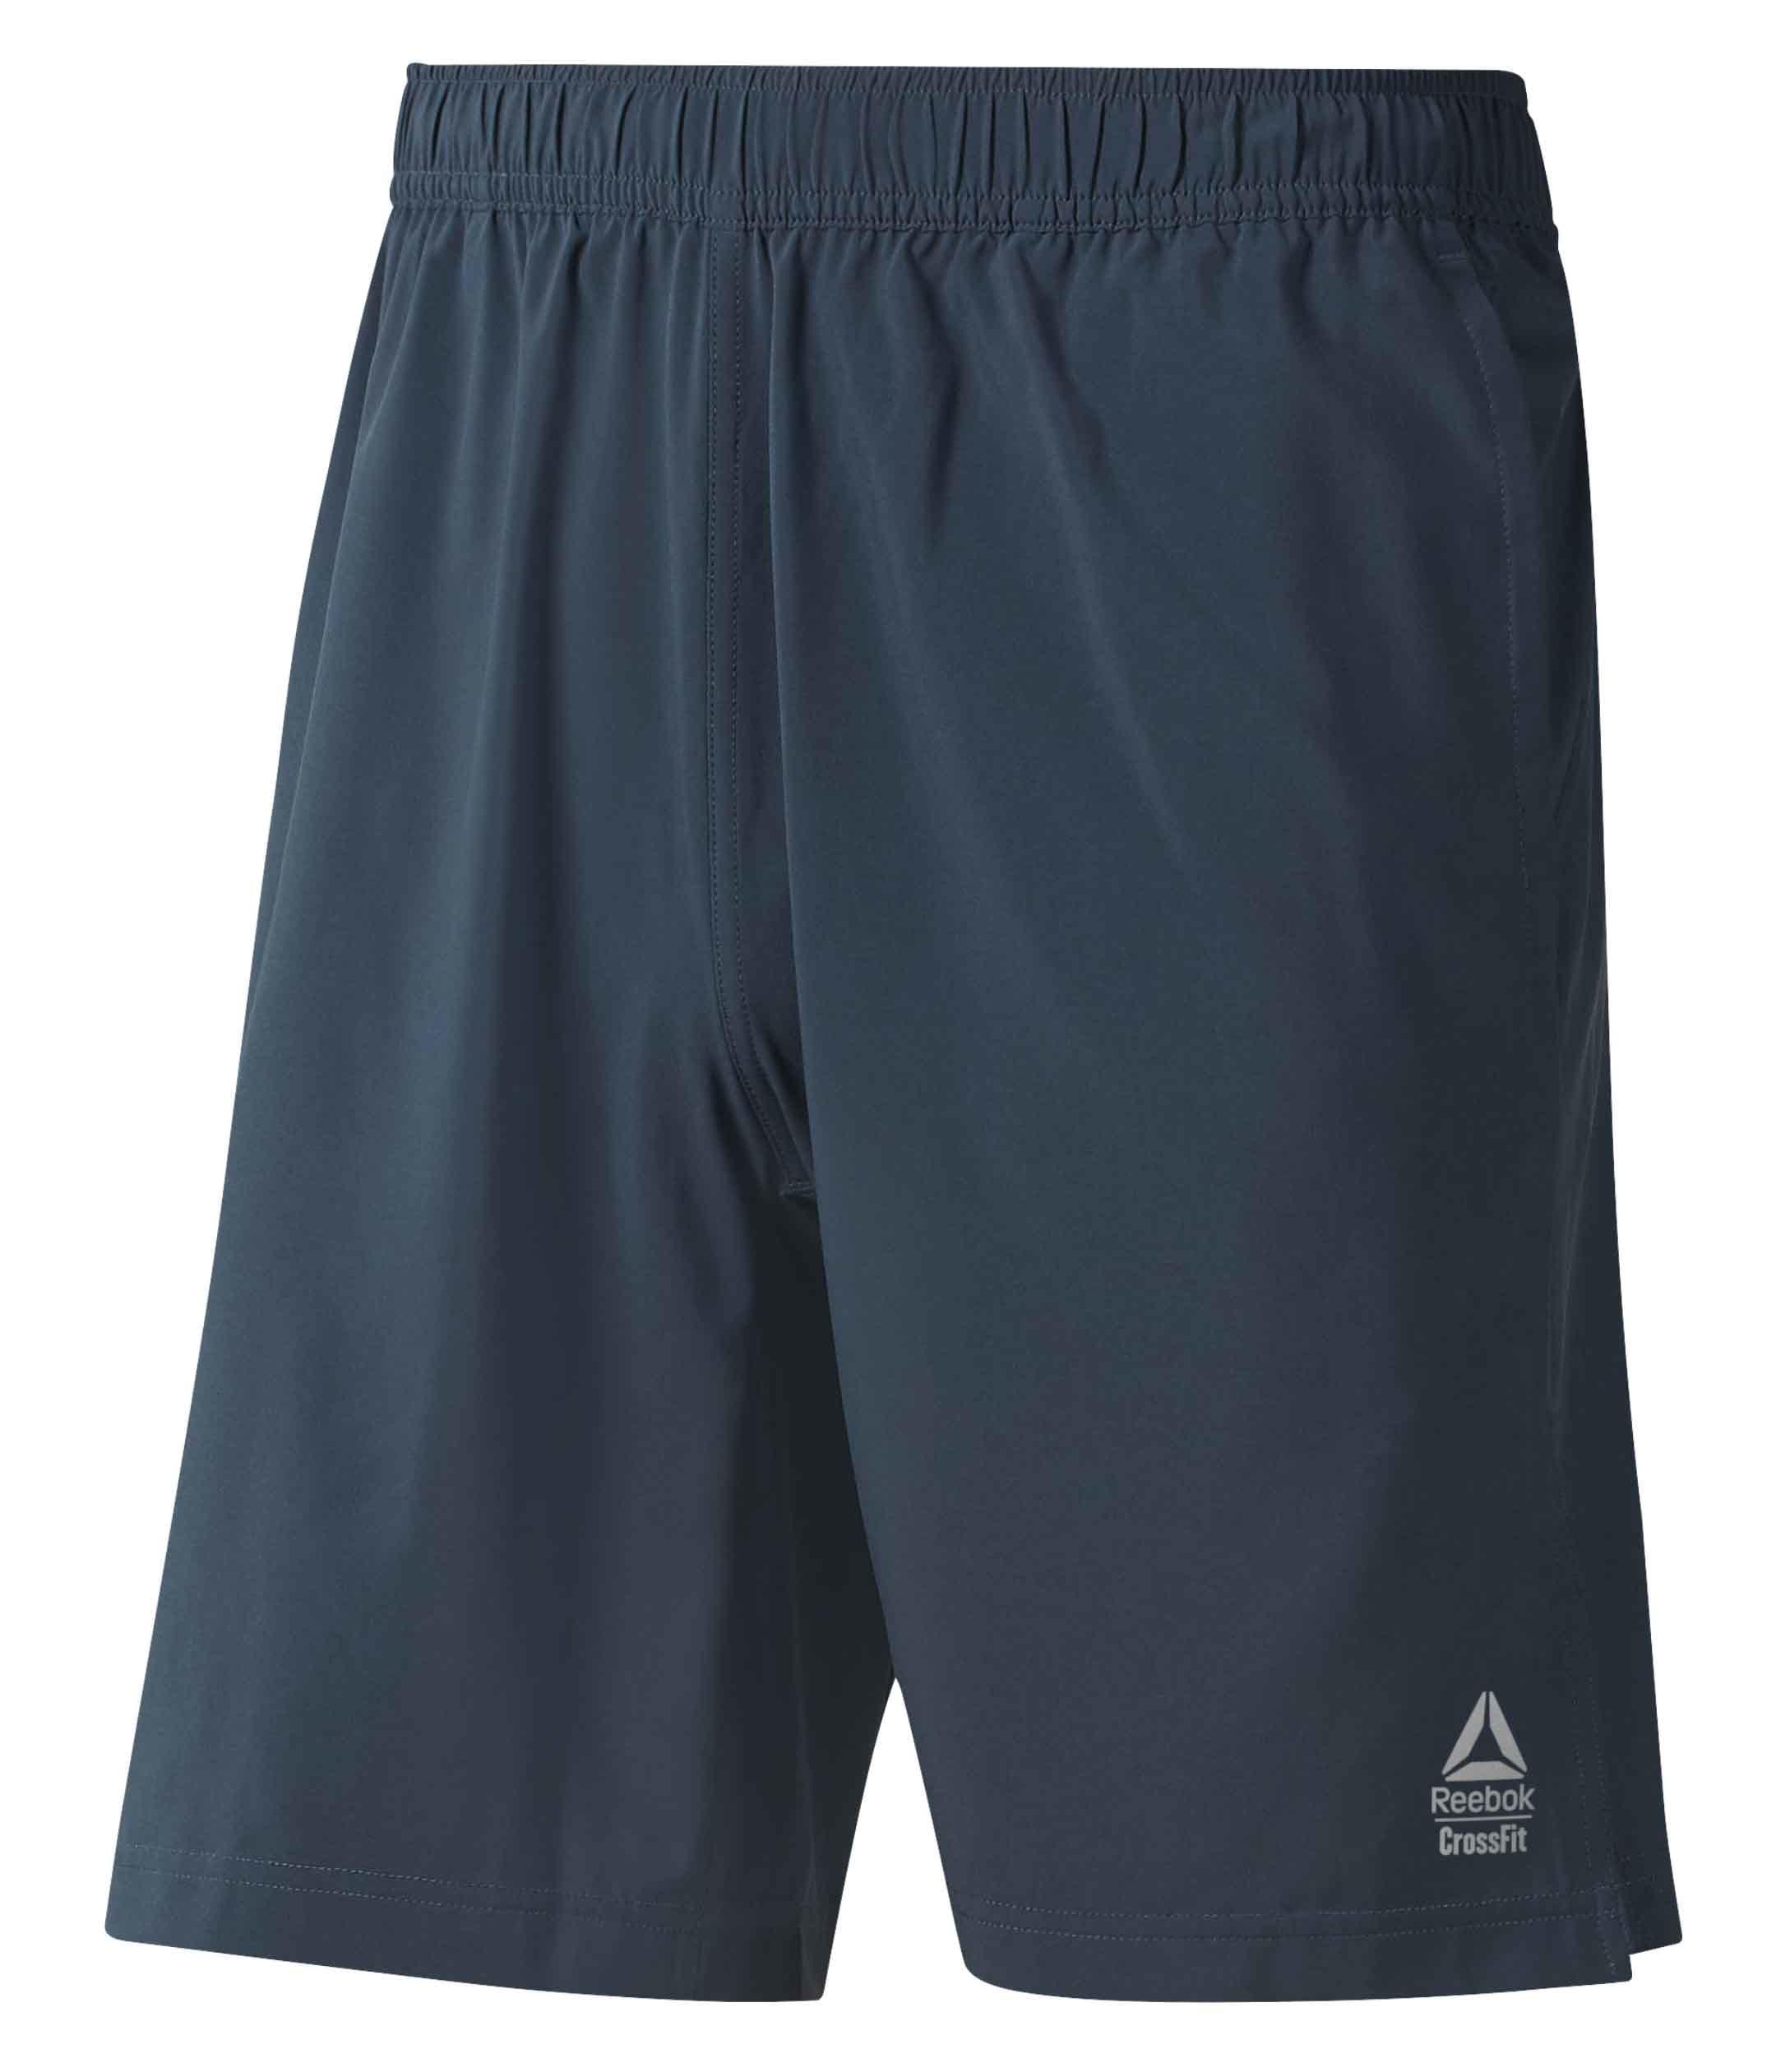 crossfit-shorts-austin